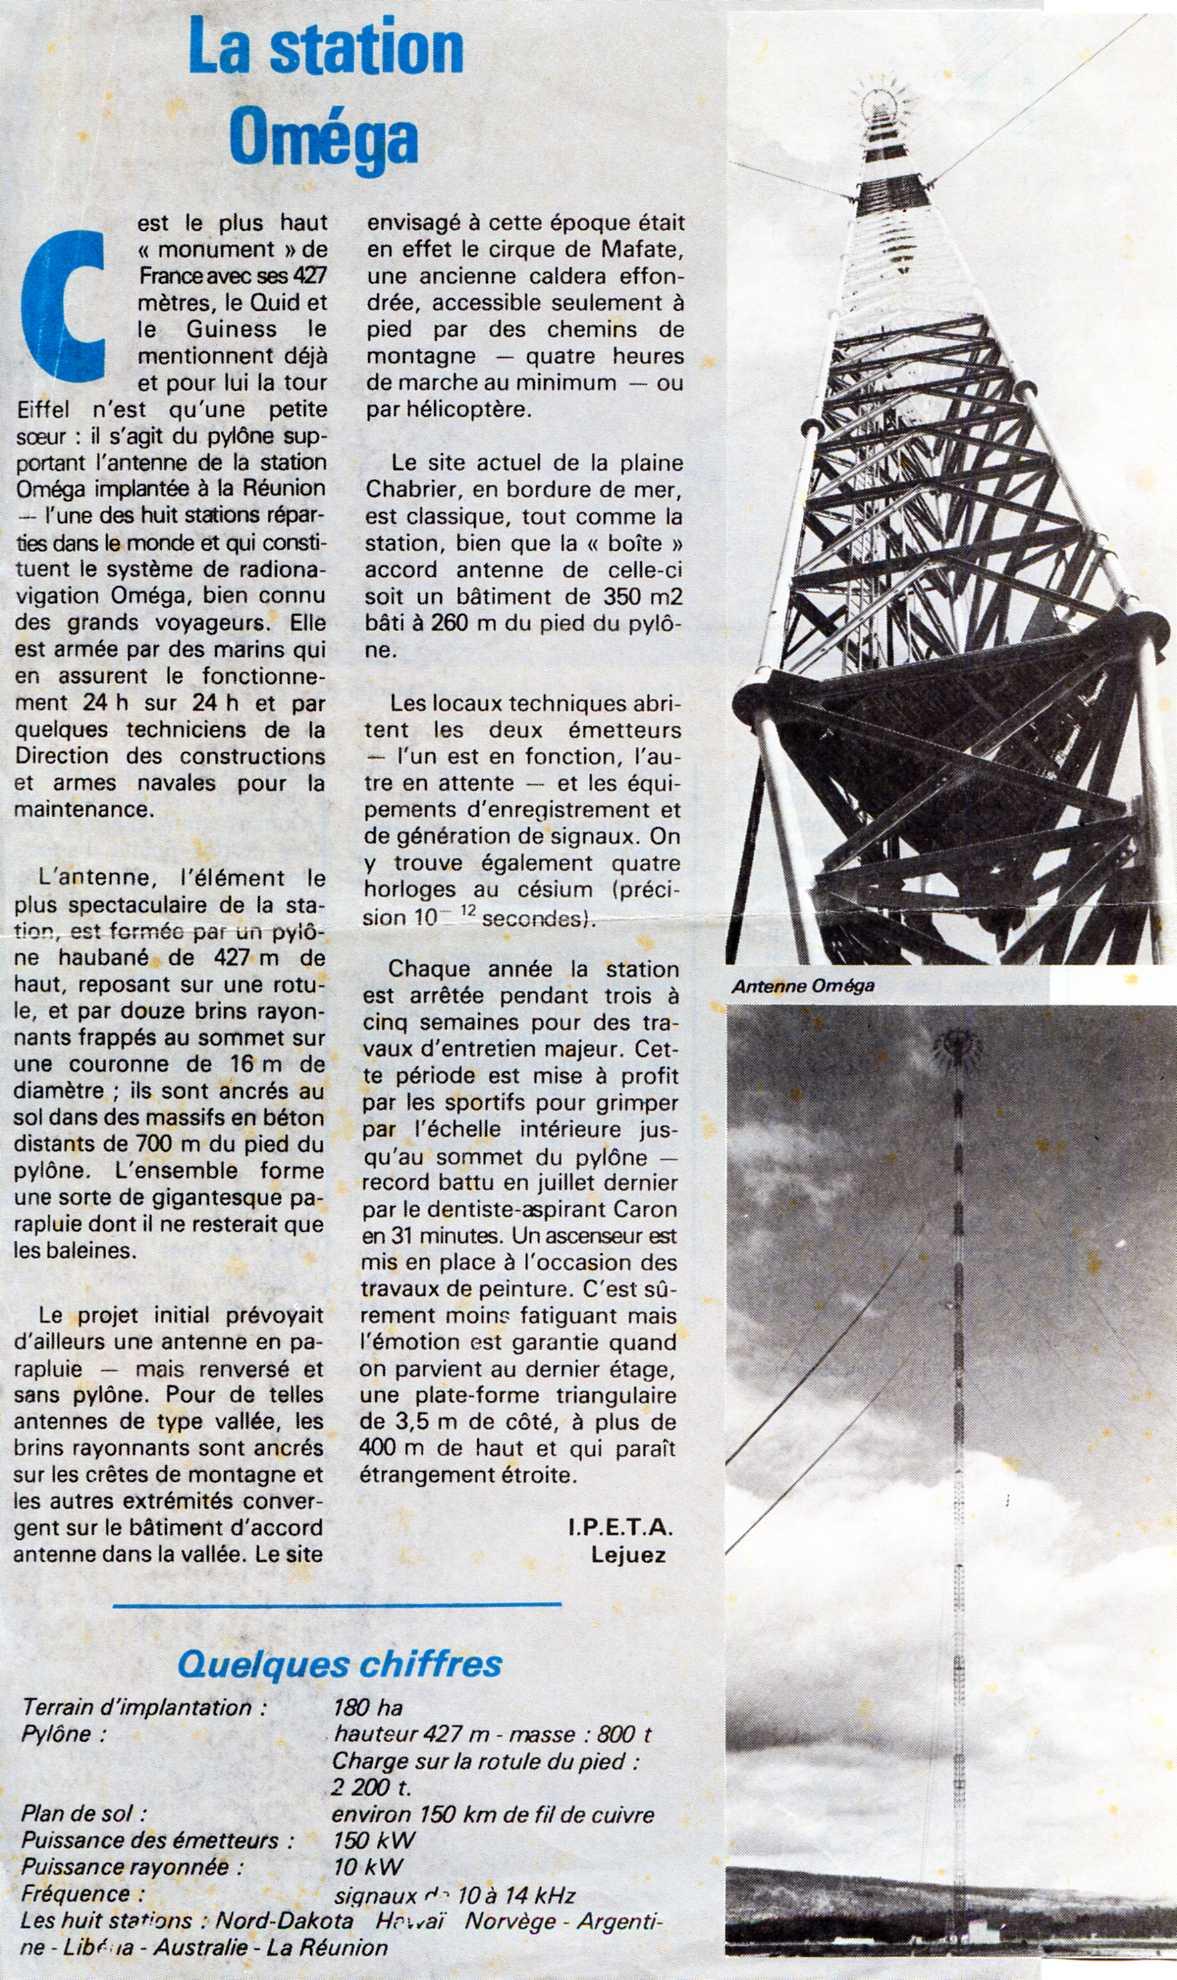 [Les stations radios et télécommunications] Station OMEGA 9490573501